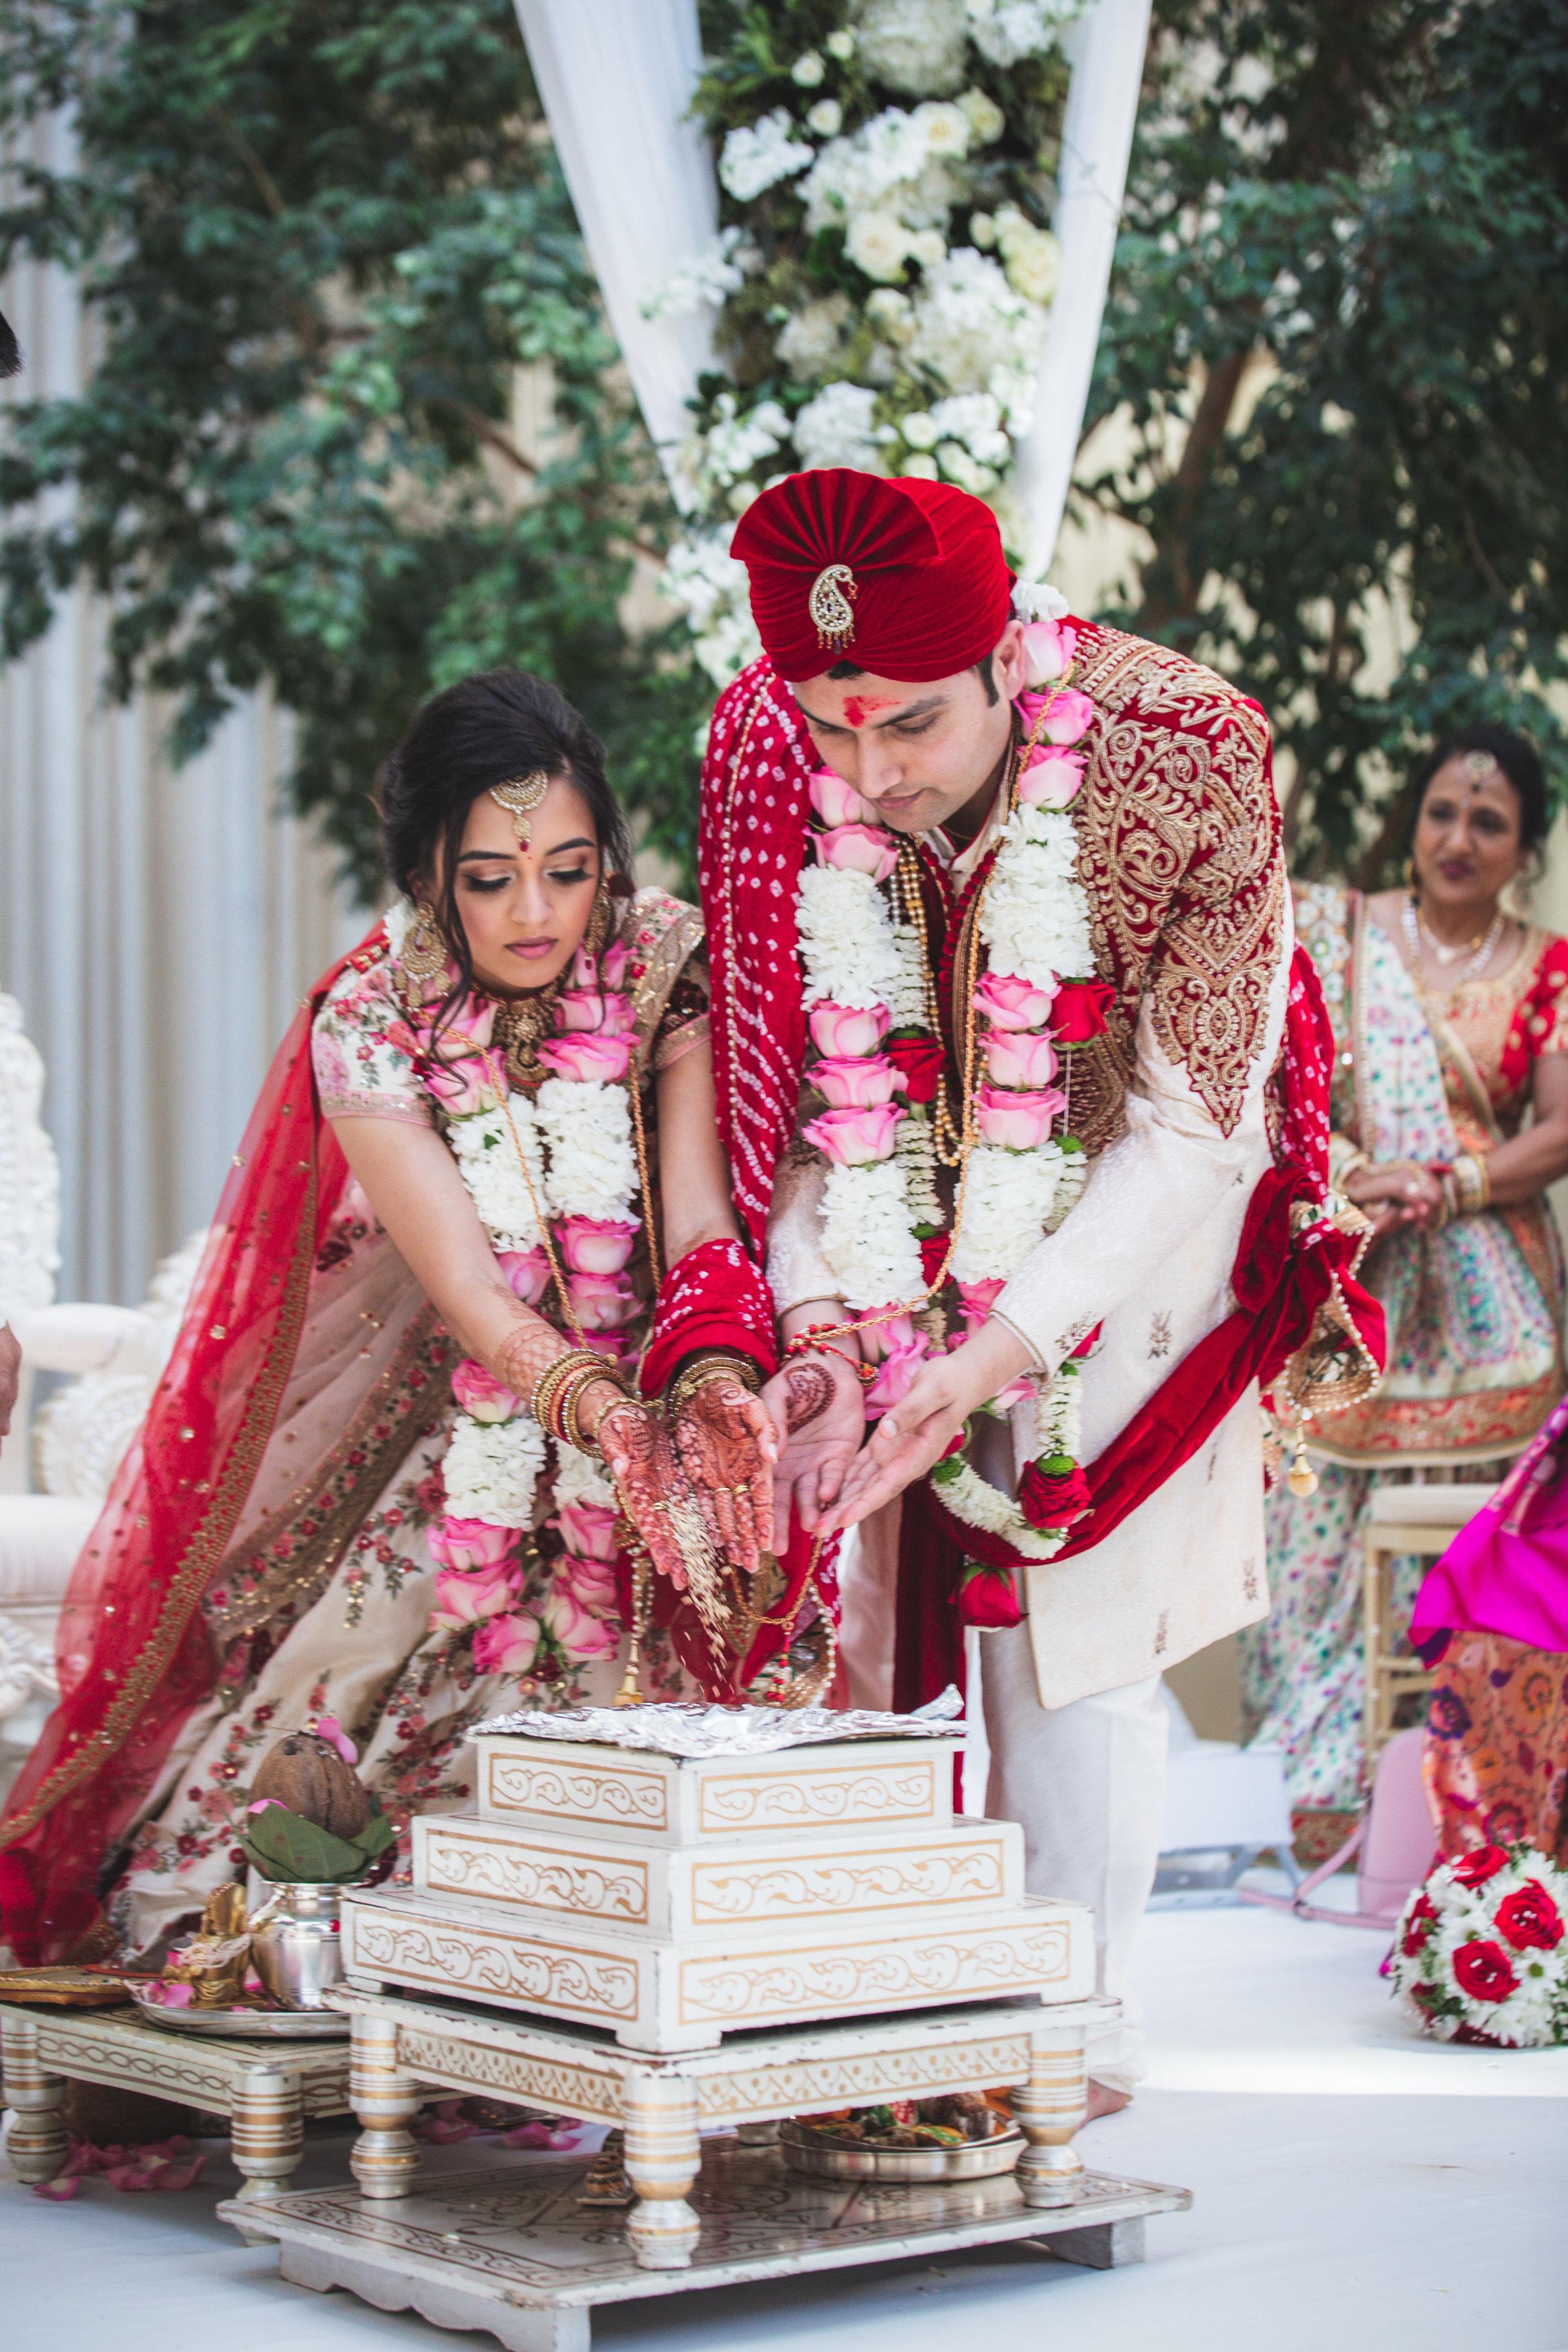 02-Setu-Shivam-Ceremony-139.jpg